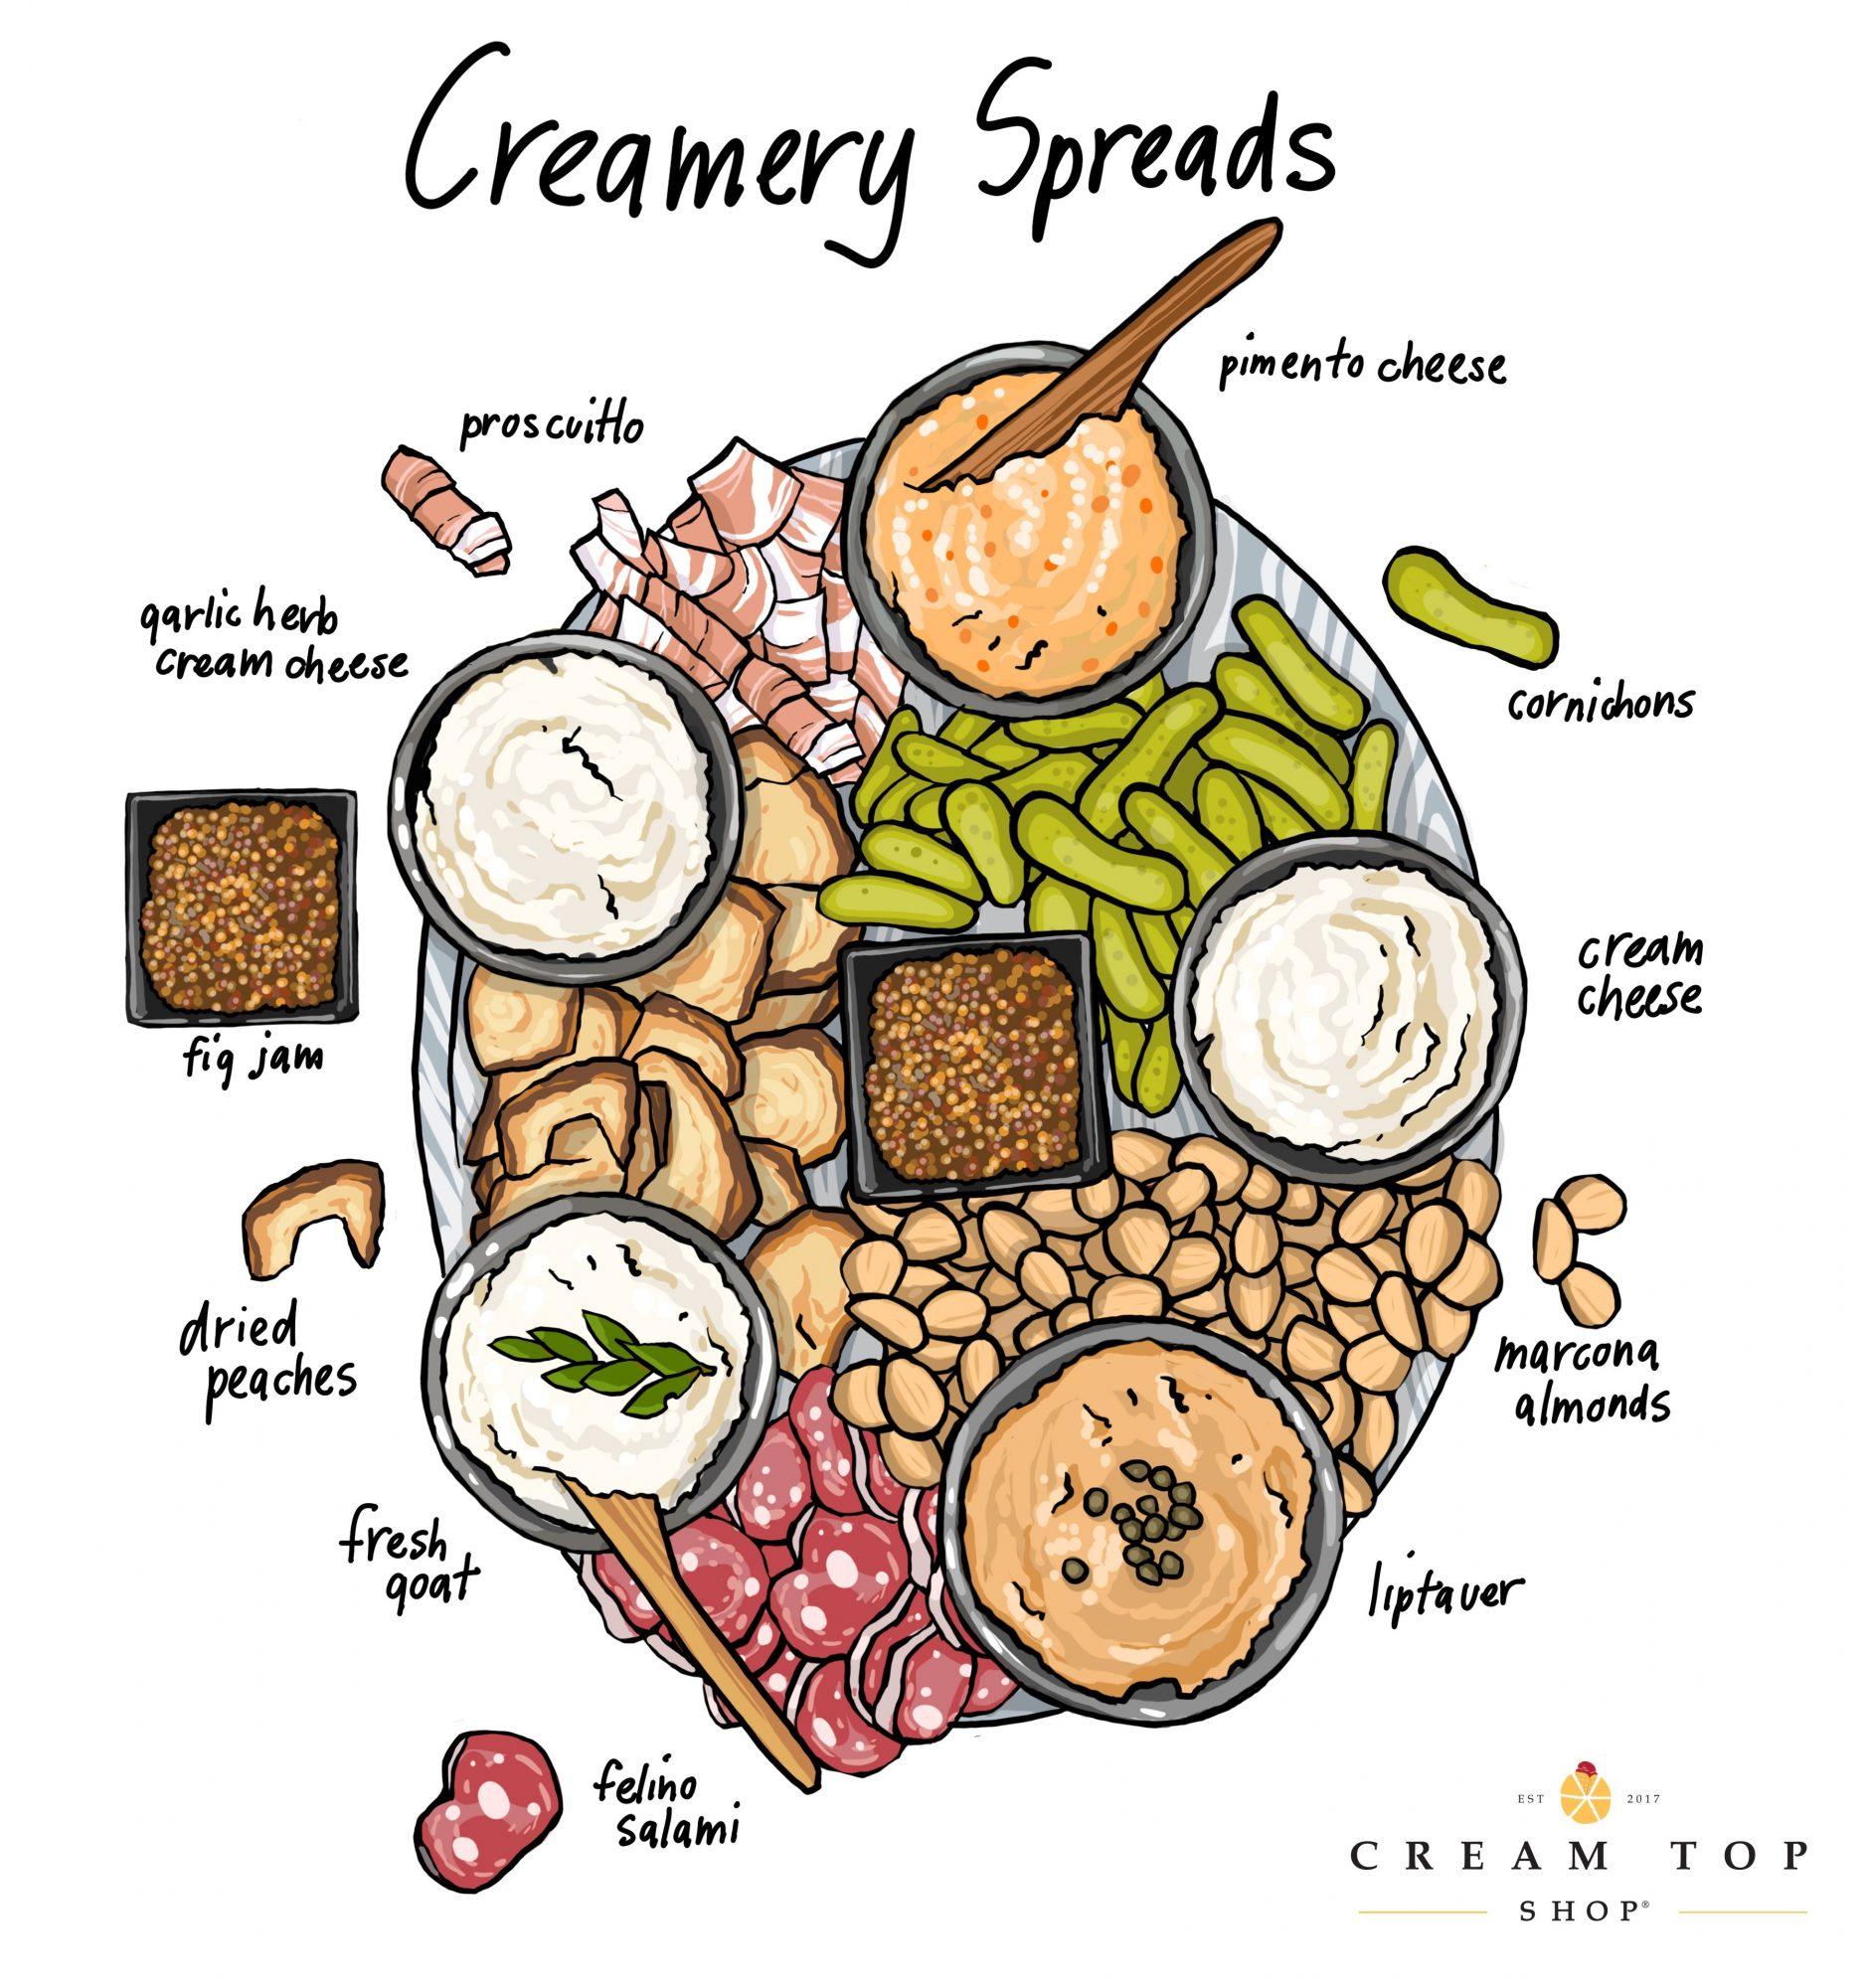 Creamery Spreads